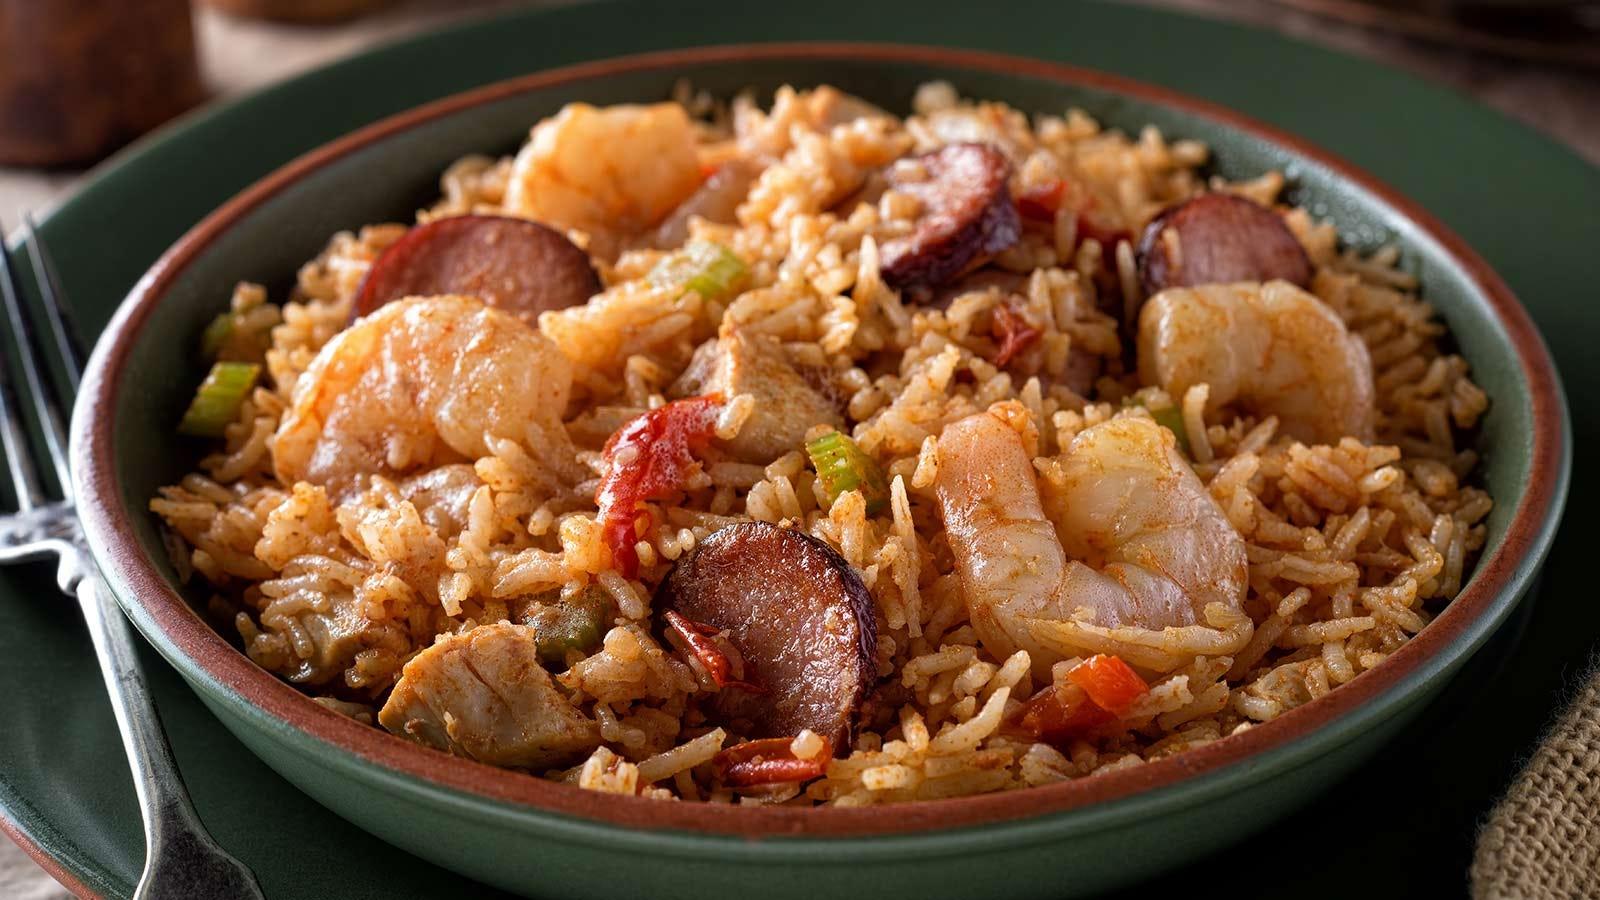 Bowl of Cajun-style jambalaya with shrimp, chicken, and sausage.